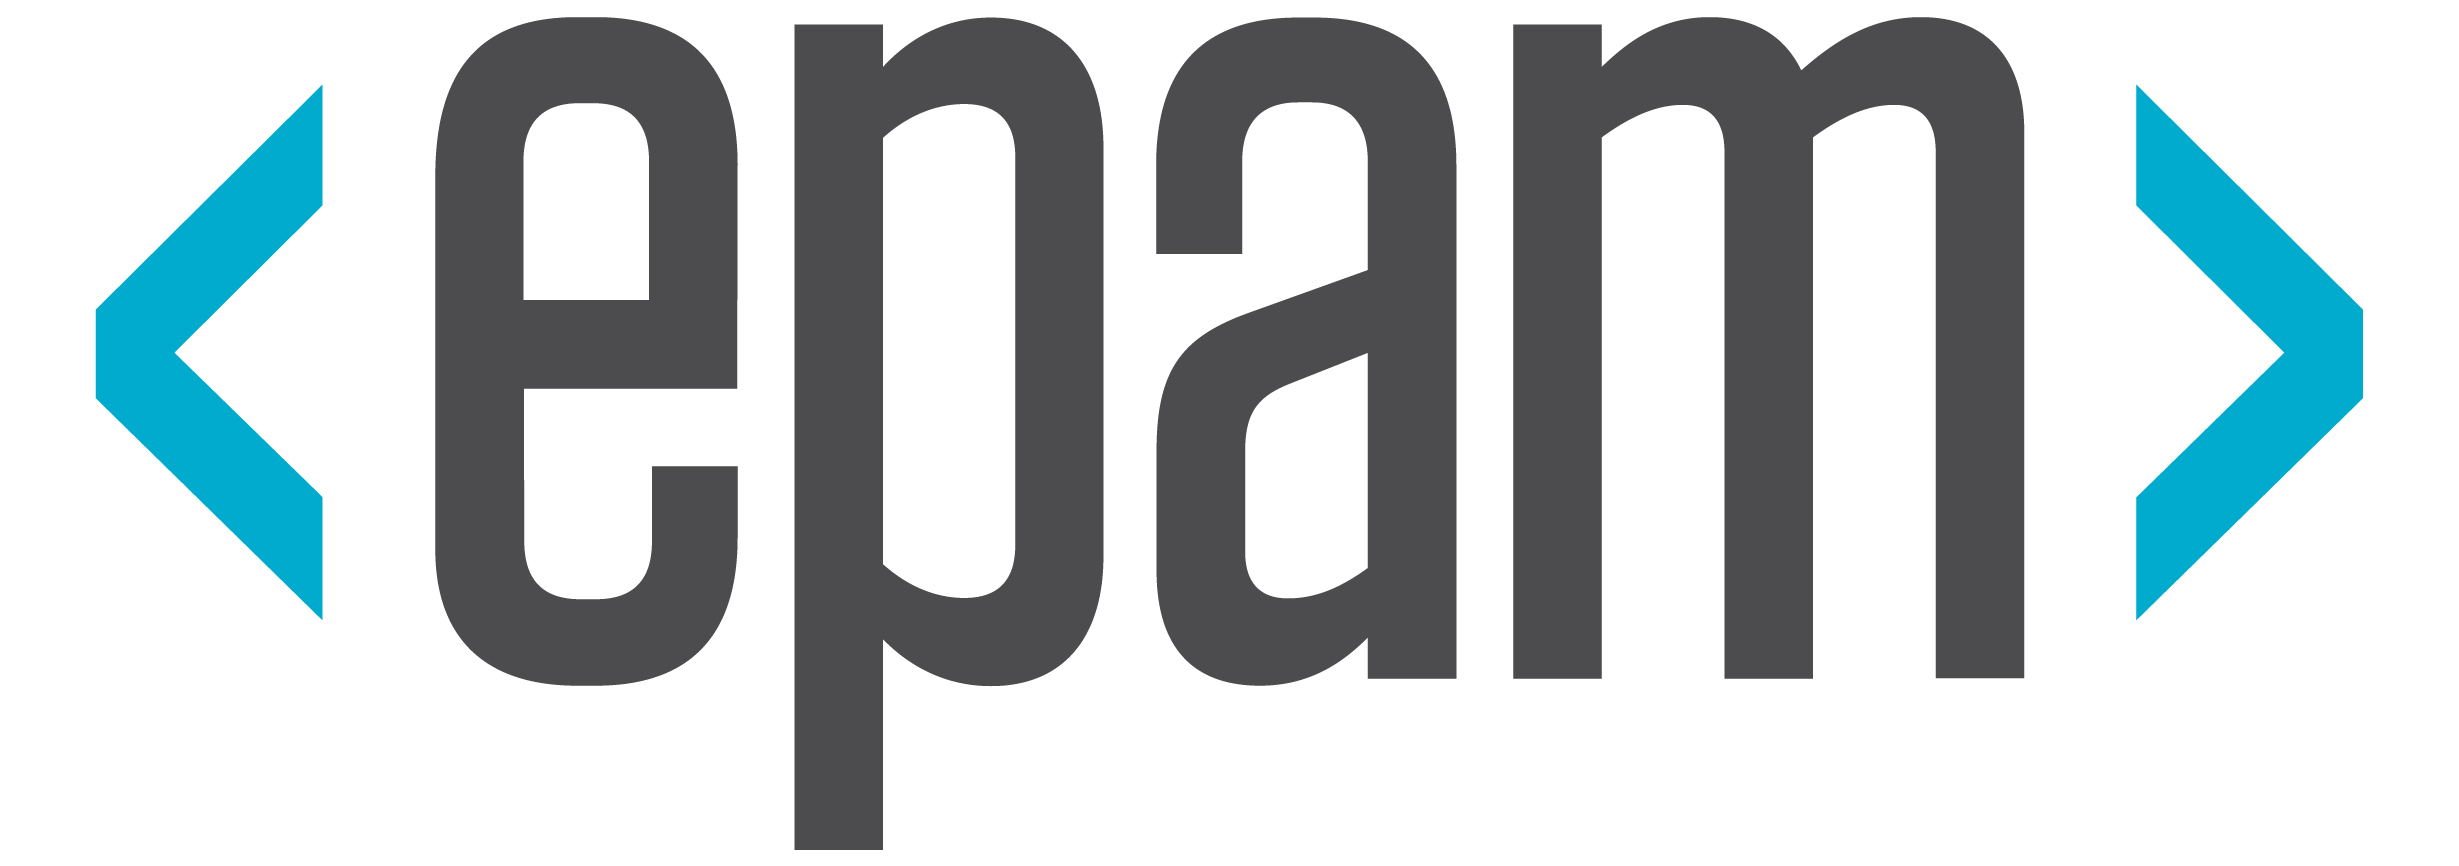 EPAM_LOGO-RGB_Primary.jpg